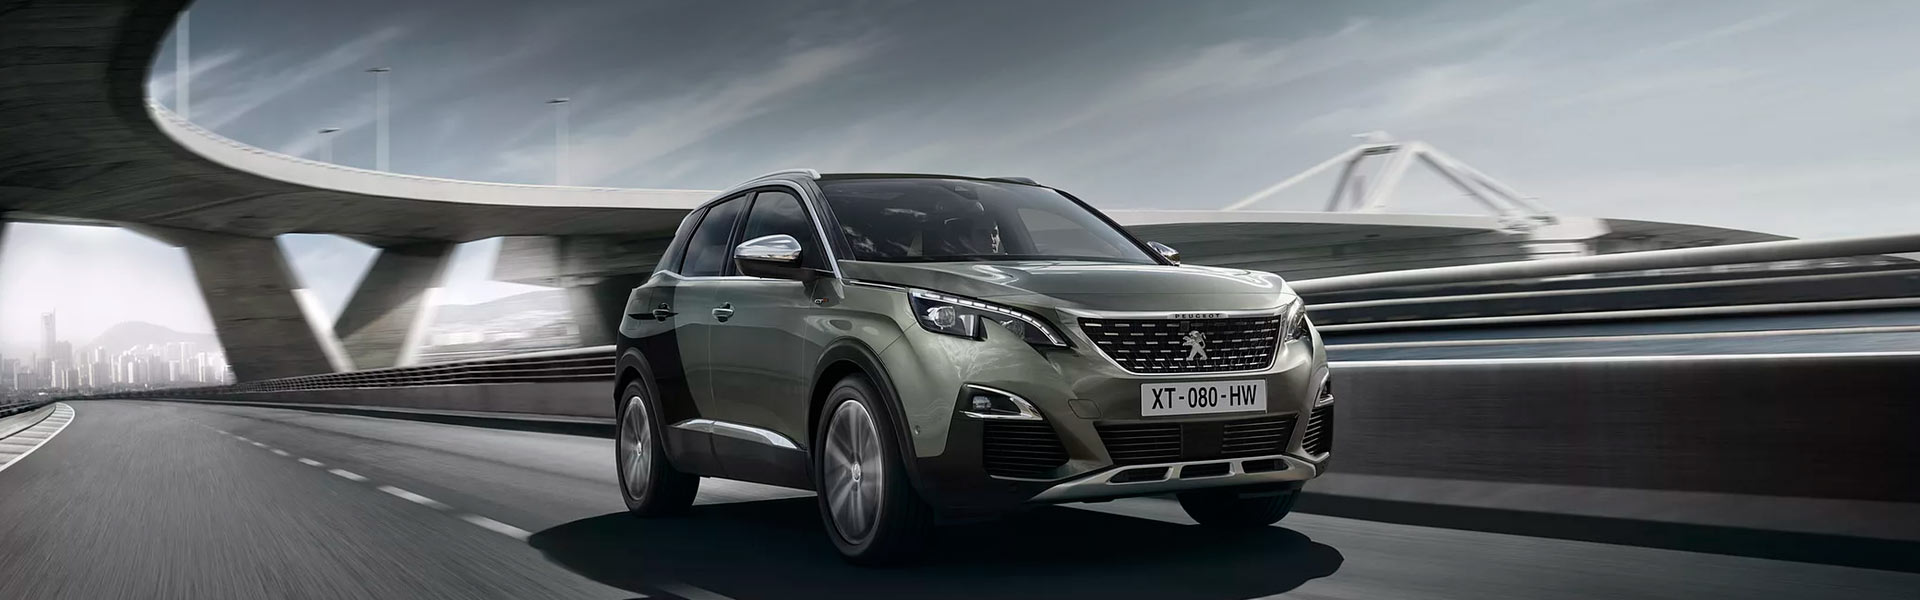 Сервис и ремонт Peugeot